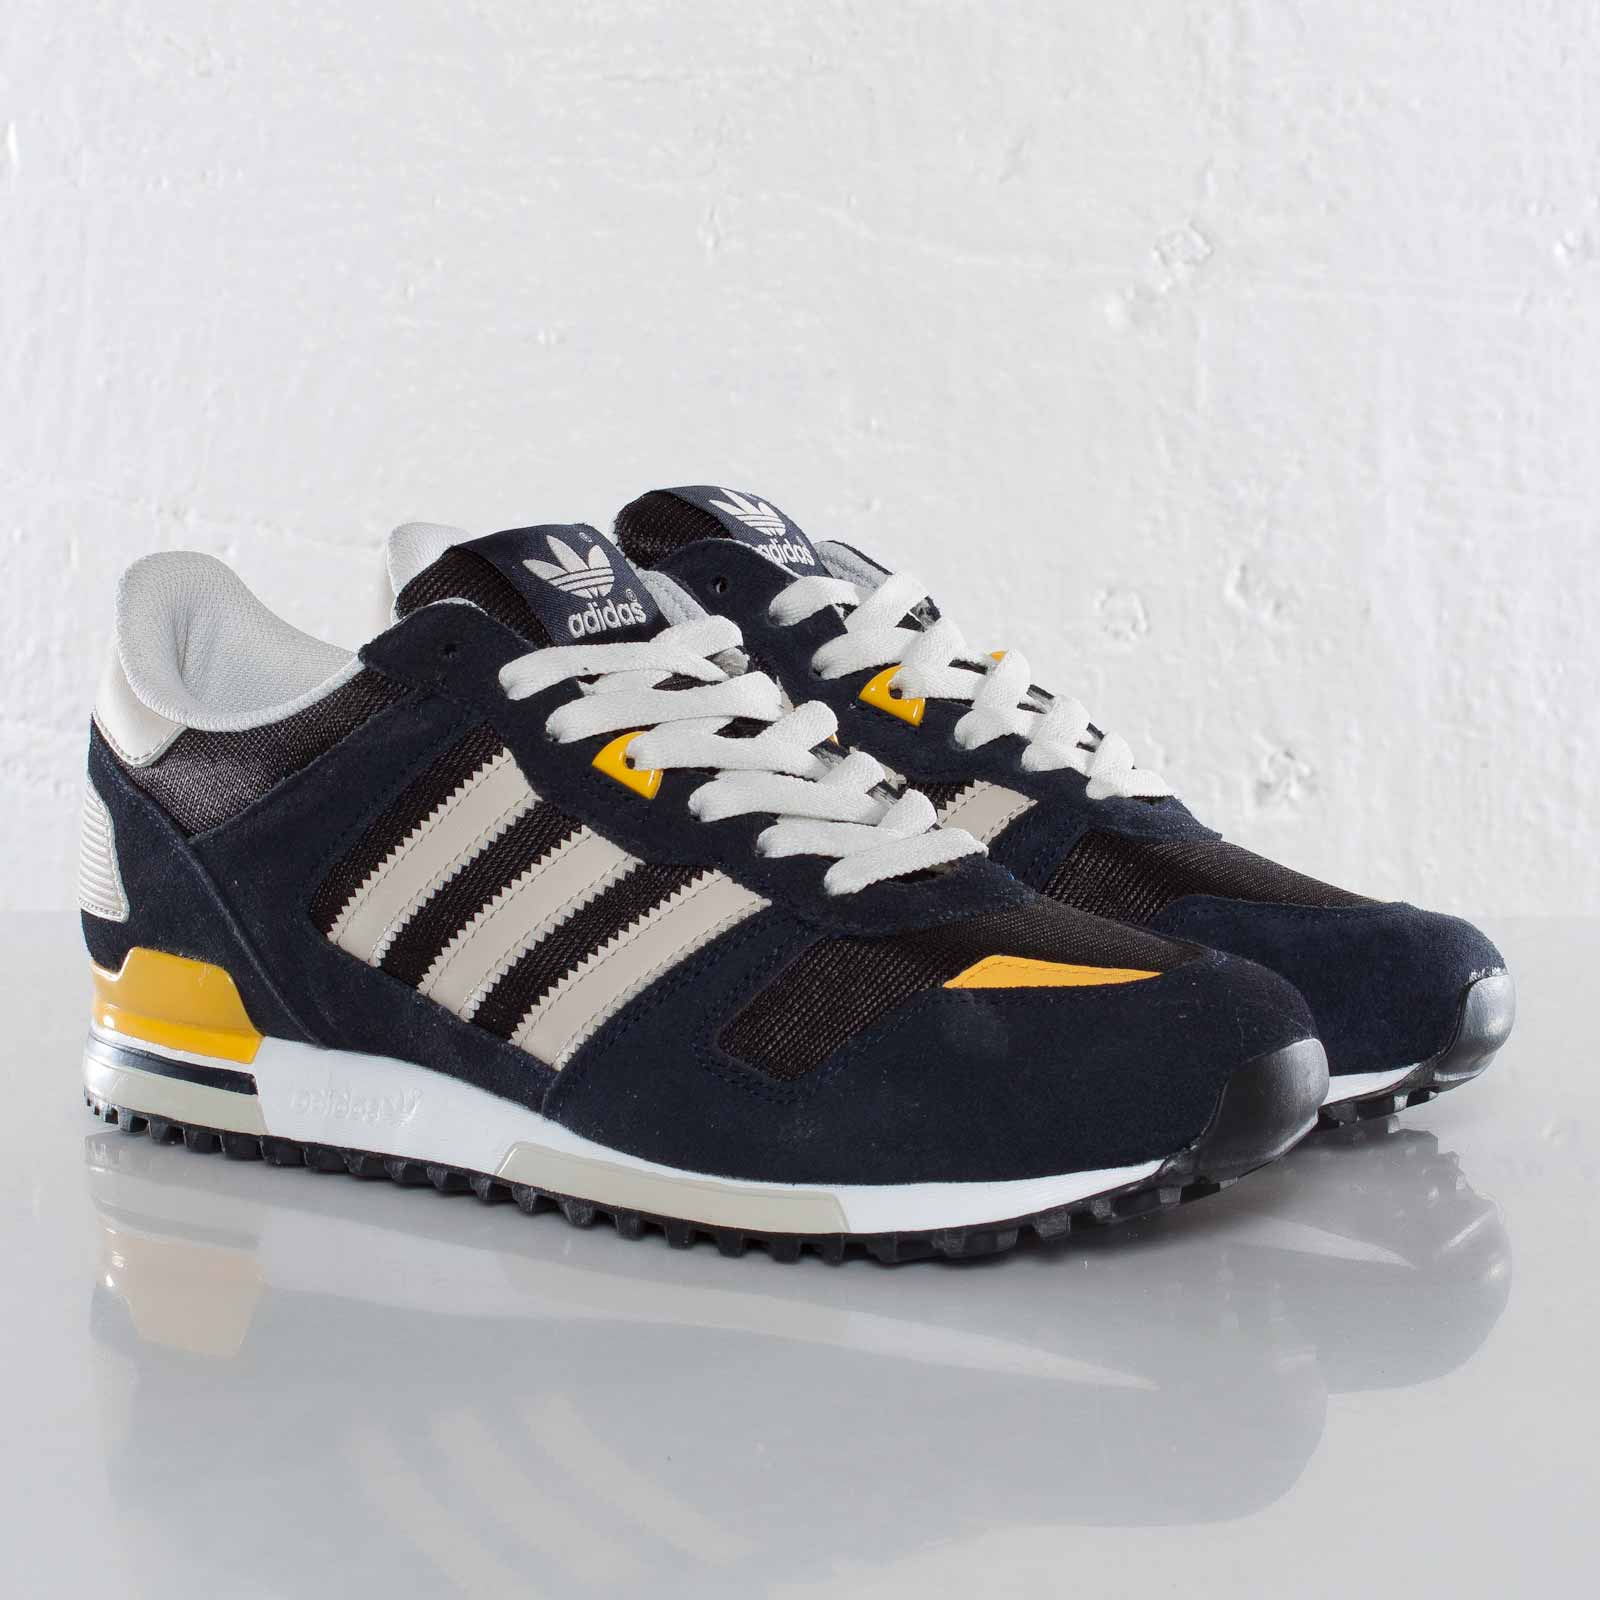 9d3526070 adidas ZX 700 M - Q23444 - Sneakersnstuff